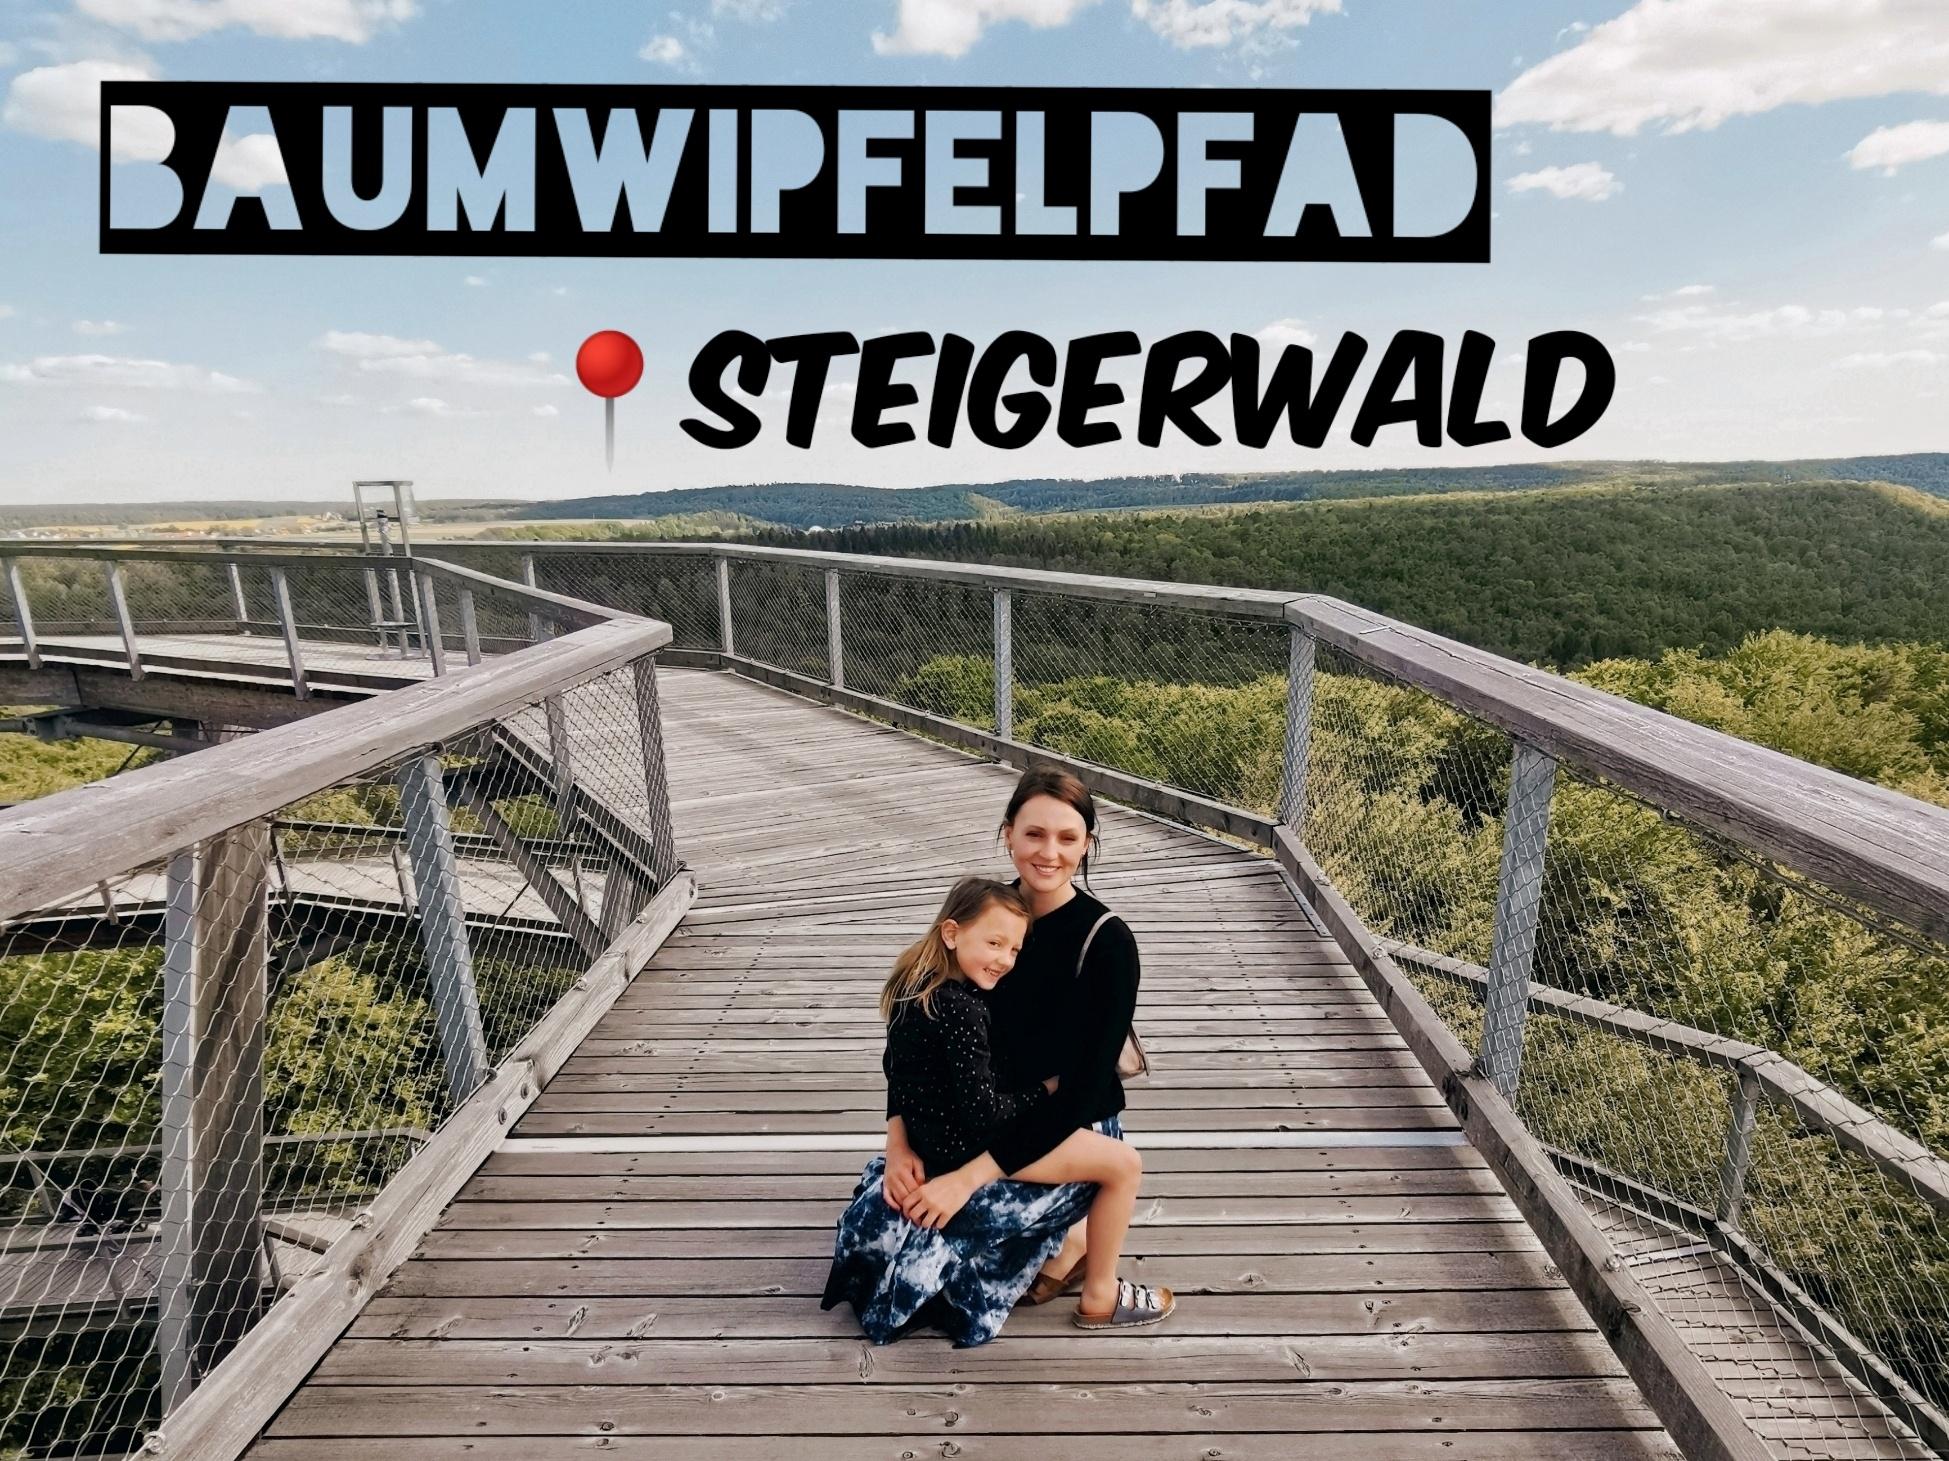 Baumwipfelpfad Steigerwald